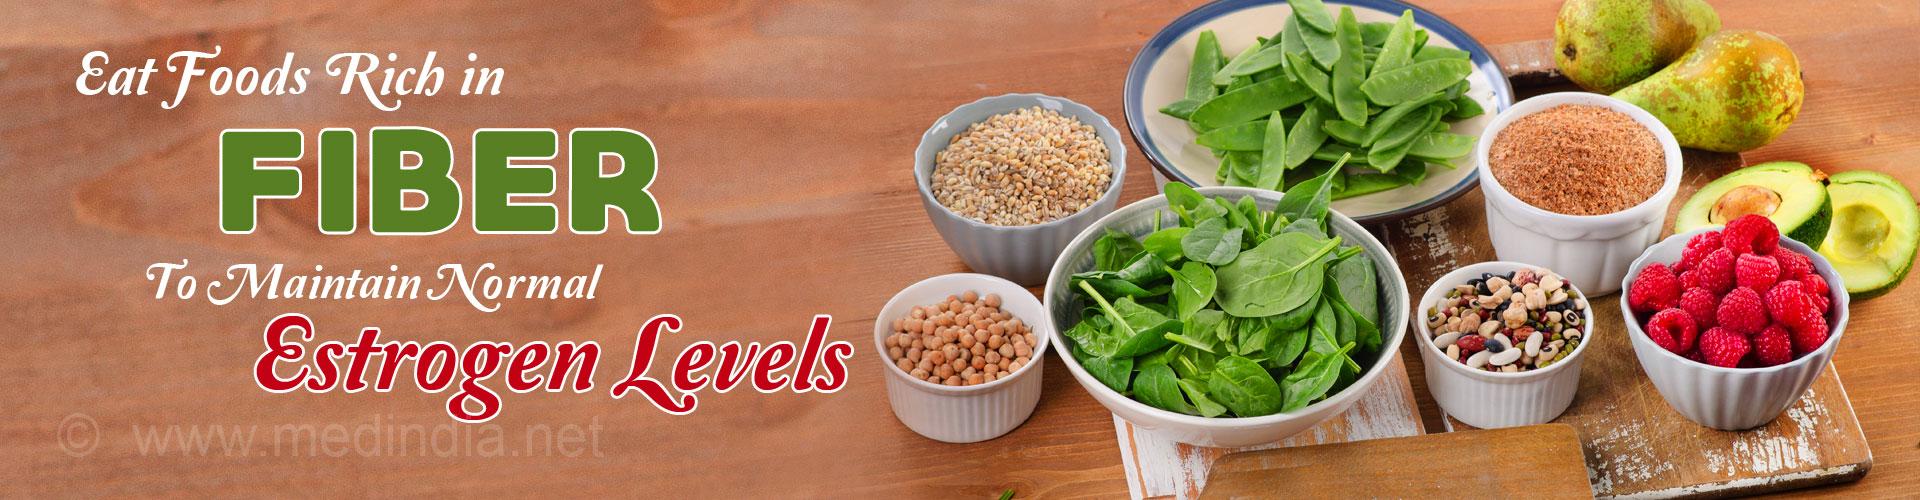 Eat foods rich in fiber to maintain normal estrogen levels